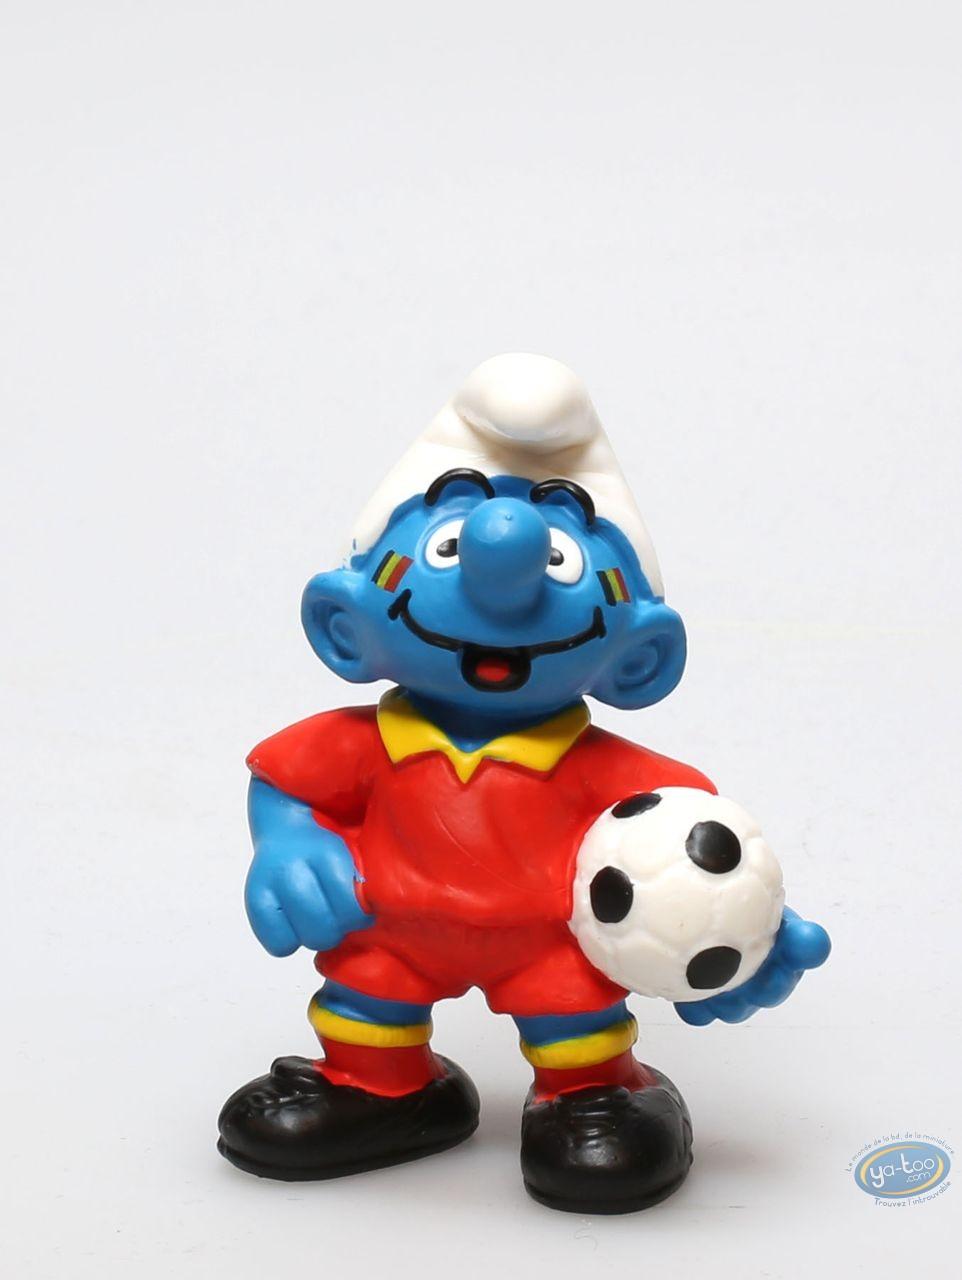 Plastic Figurine, Smurfs (The) : Smurf Belgian Supporter in red uniform- Worldcup 2014